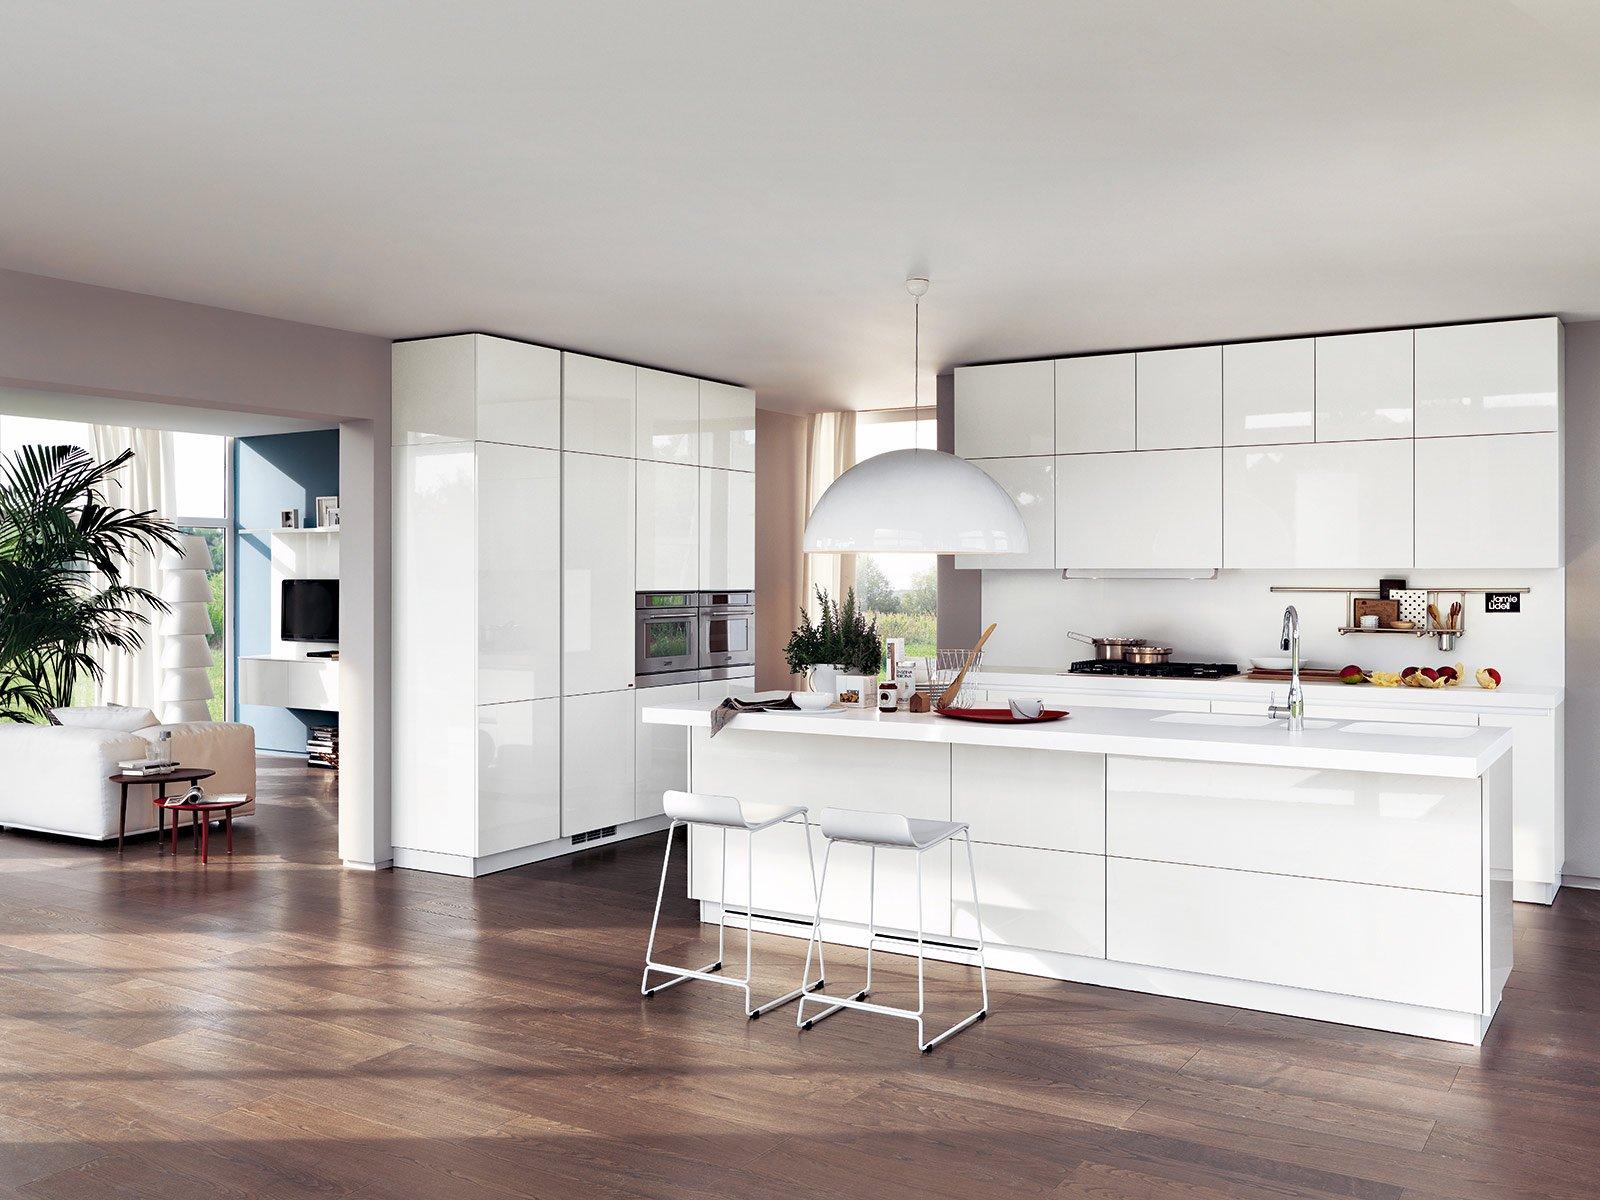 Cucina la voglio tutta bianca cose di casa for Cucina 2 metri ikea